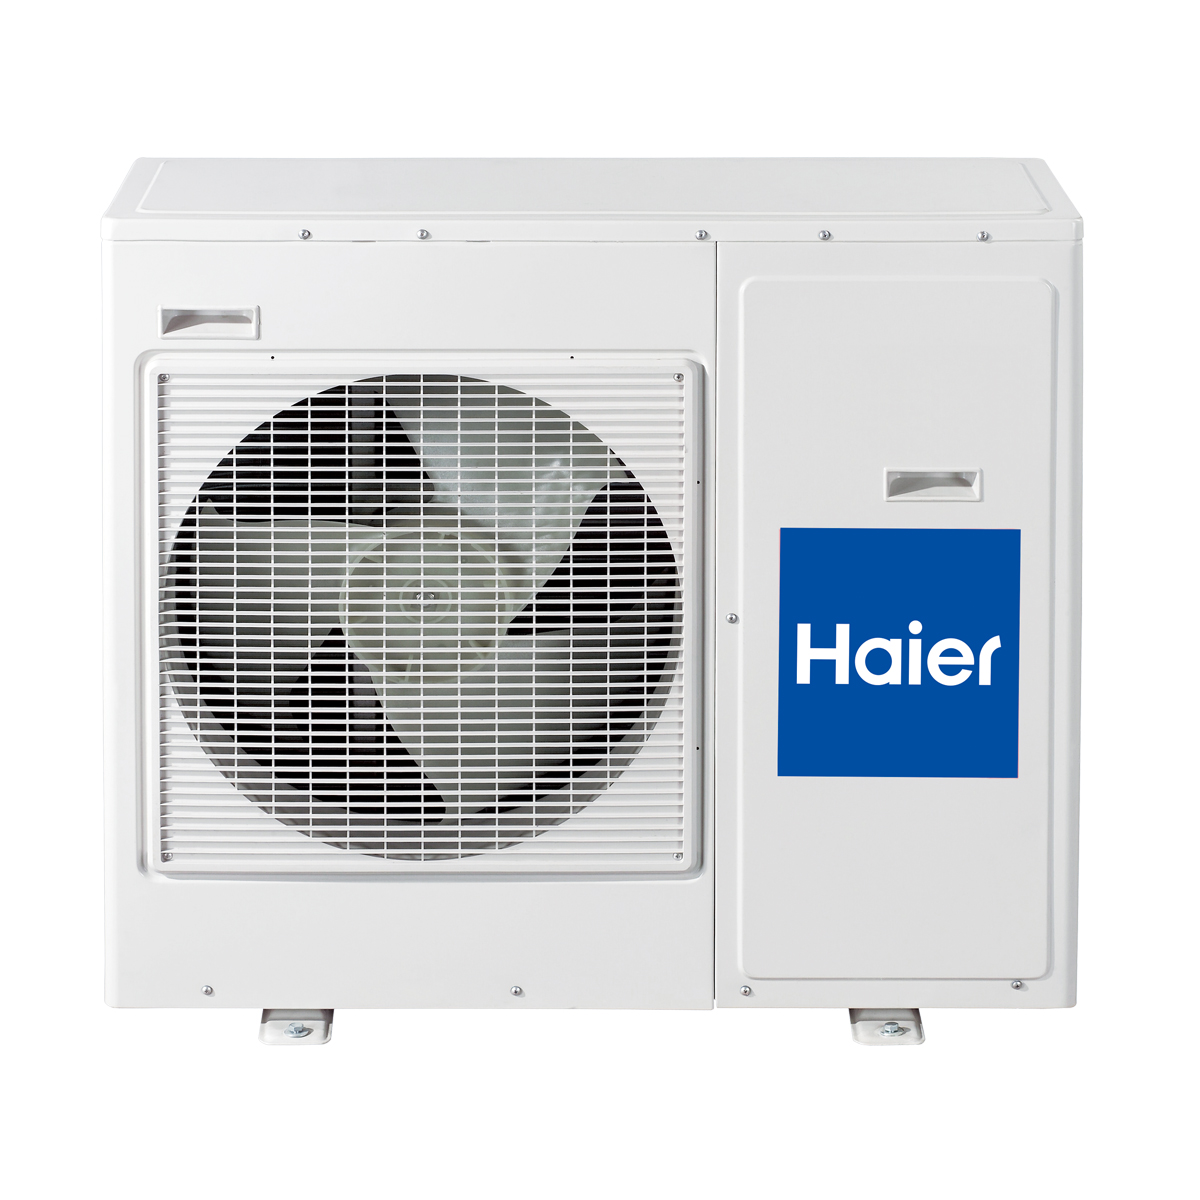 Haier aire acondicionado for Aire acondicionado haier precios